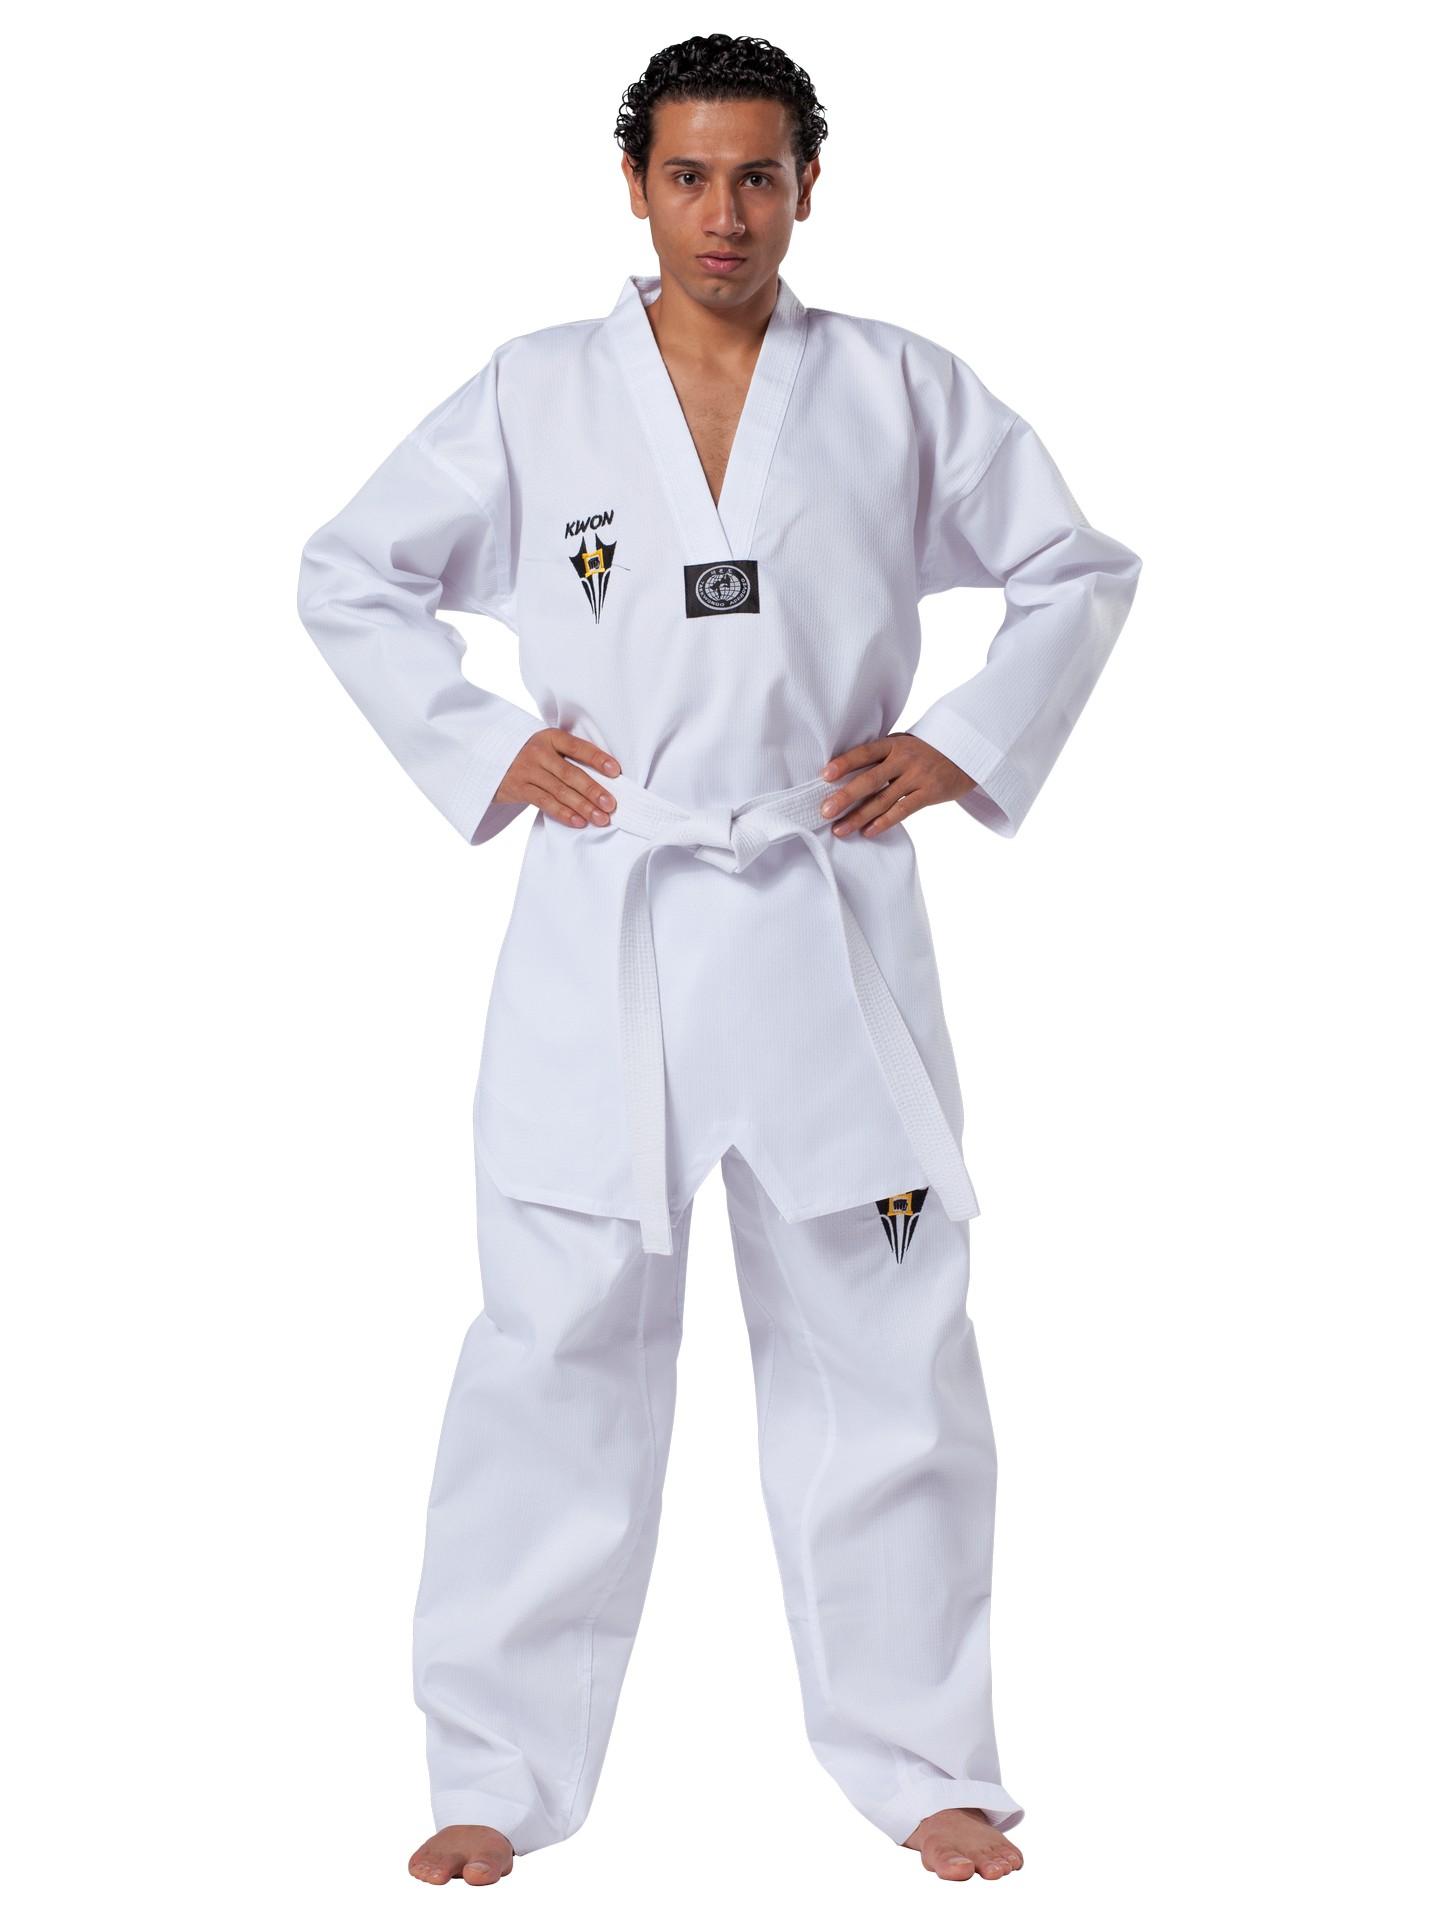 KWON Starfighter Taekwondoanzug weißes Revers